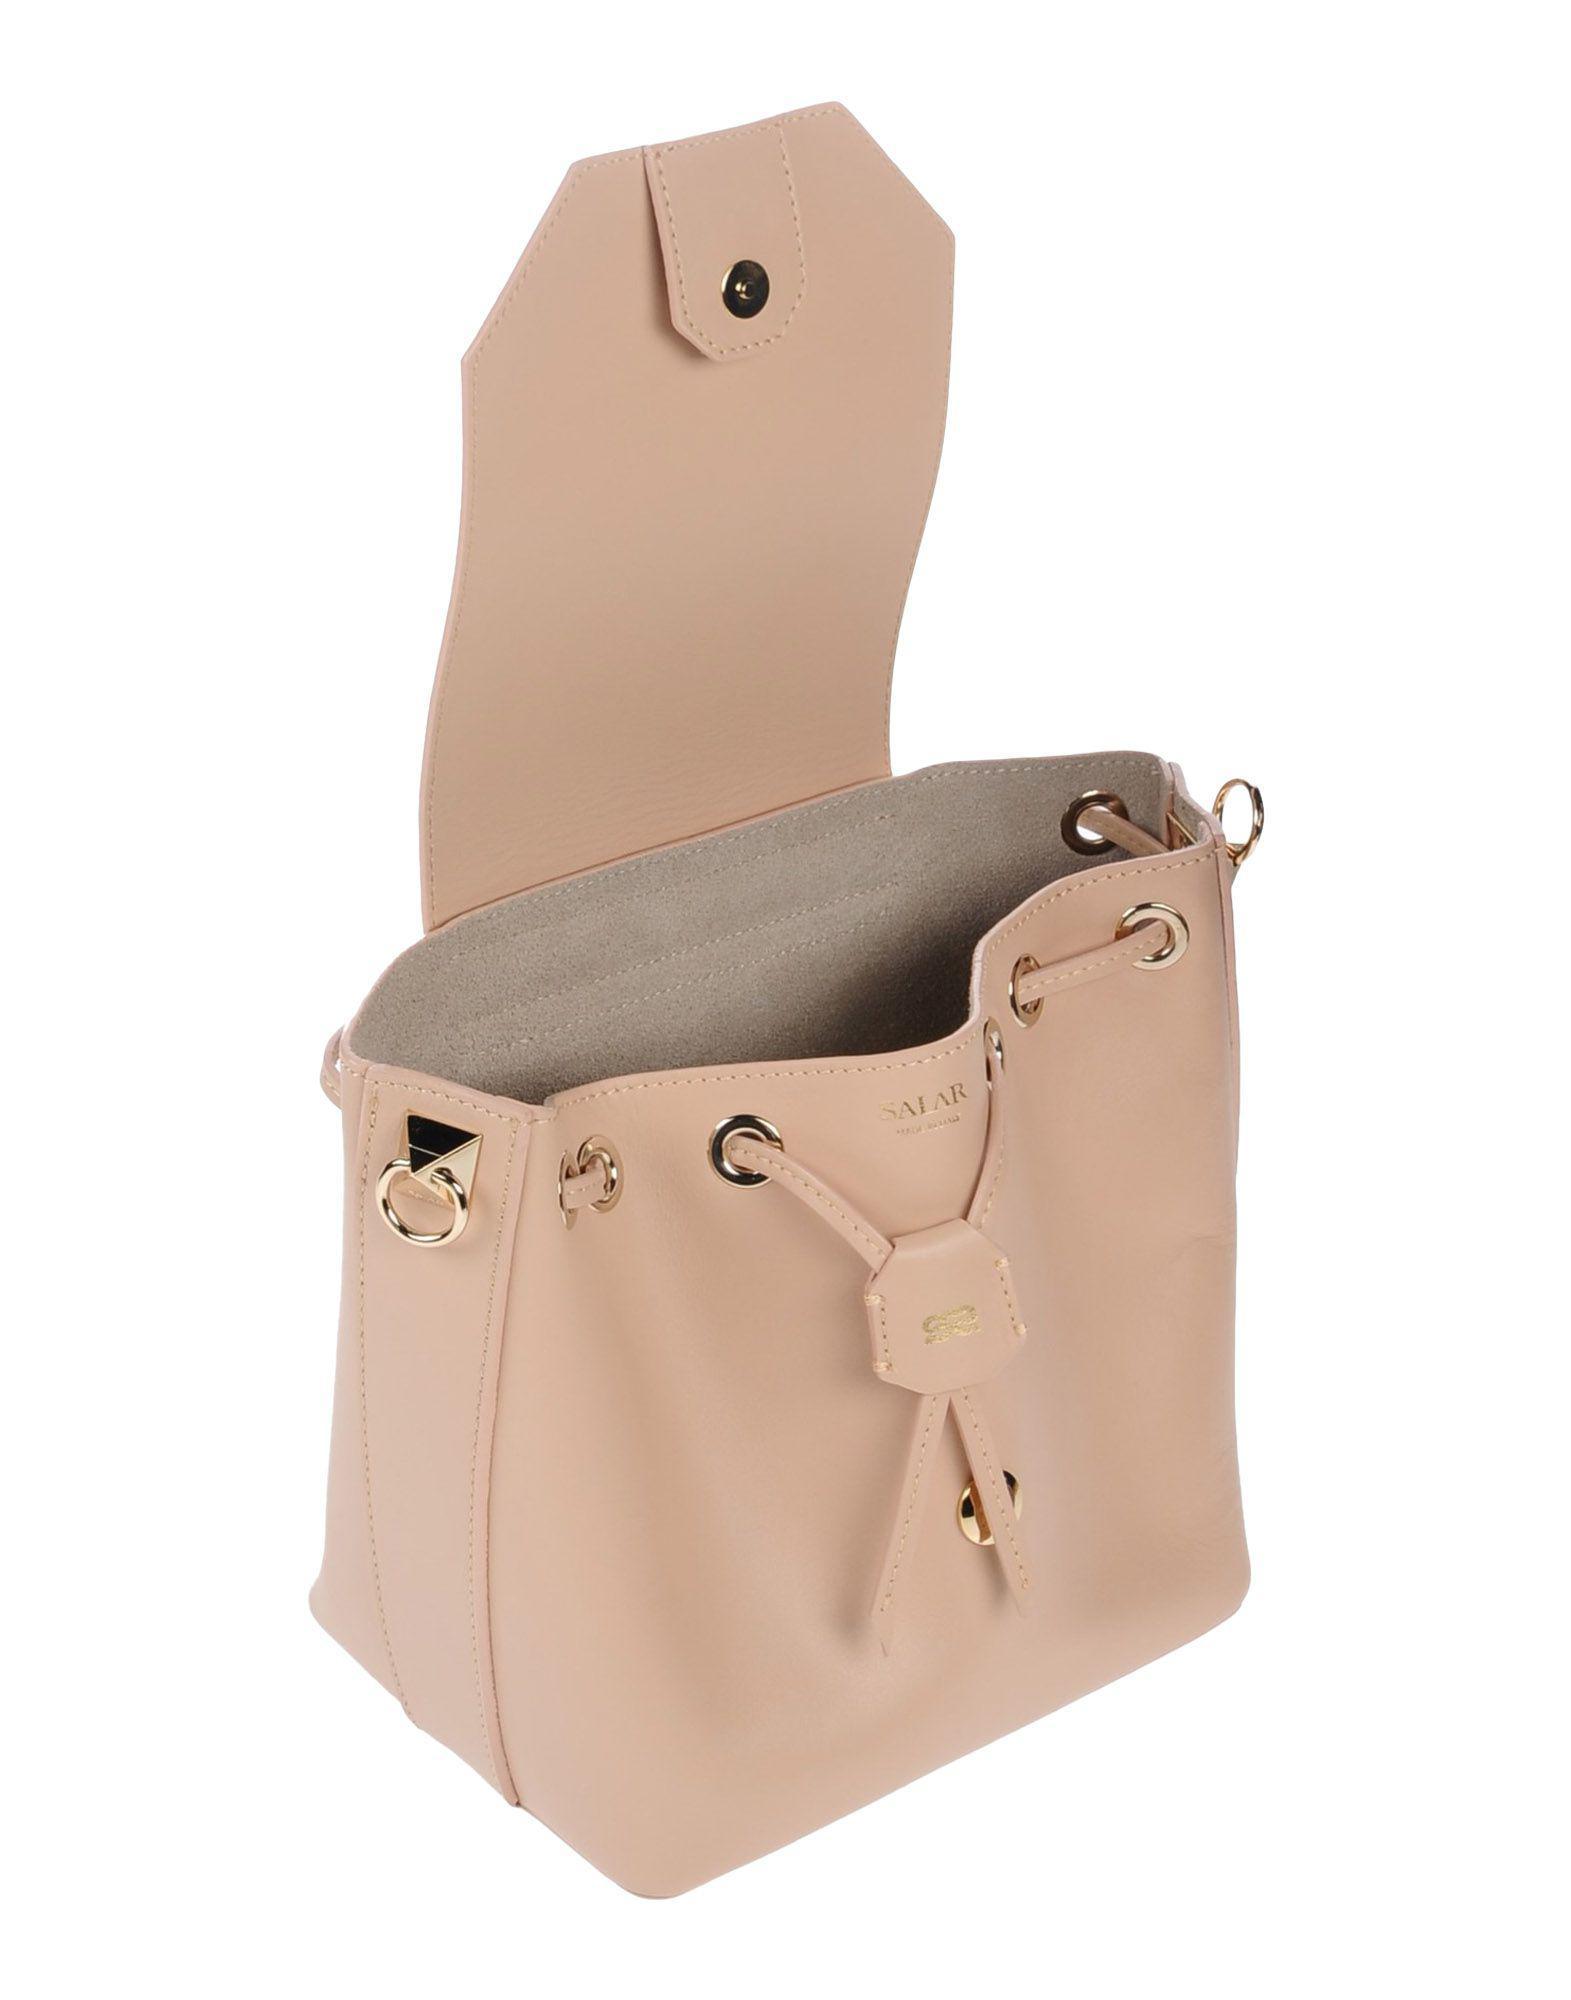 Salar Leather Cross-body Bag in Beige (Natural)